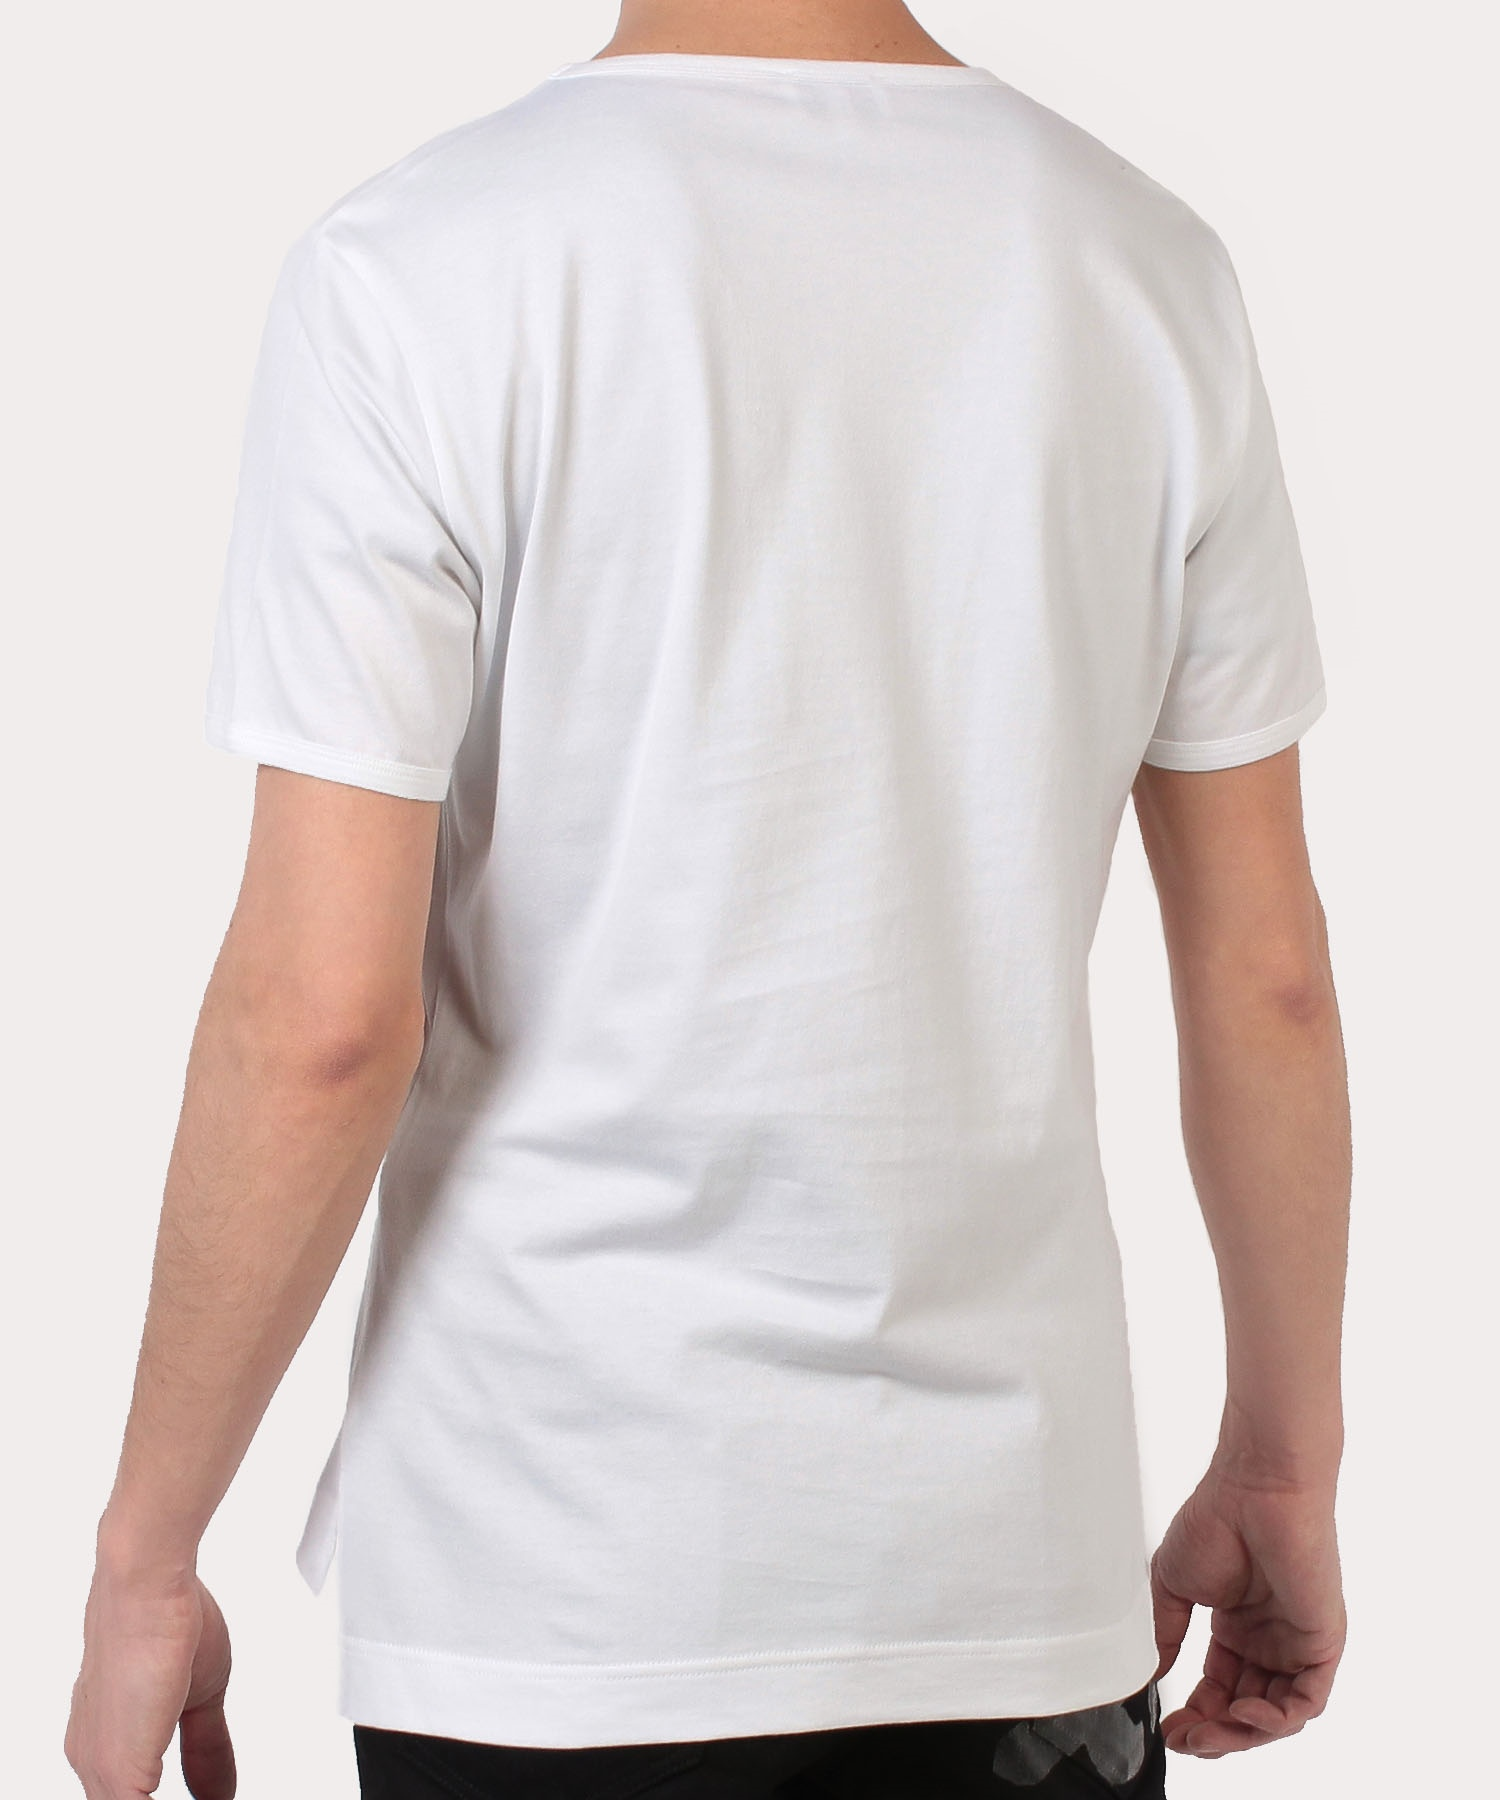 NEWフラワー クラシック半袖Tシャツ